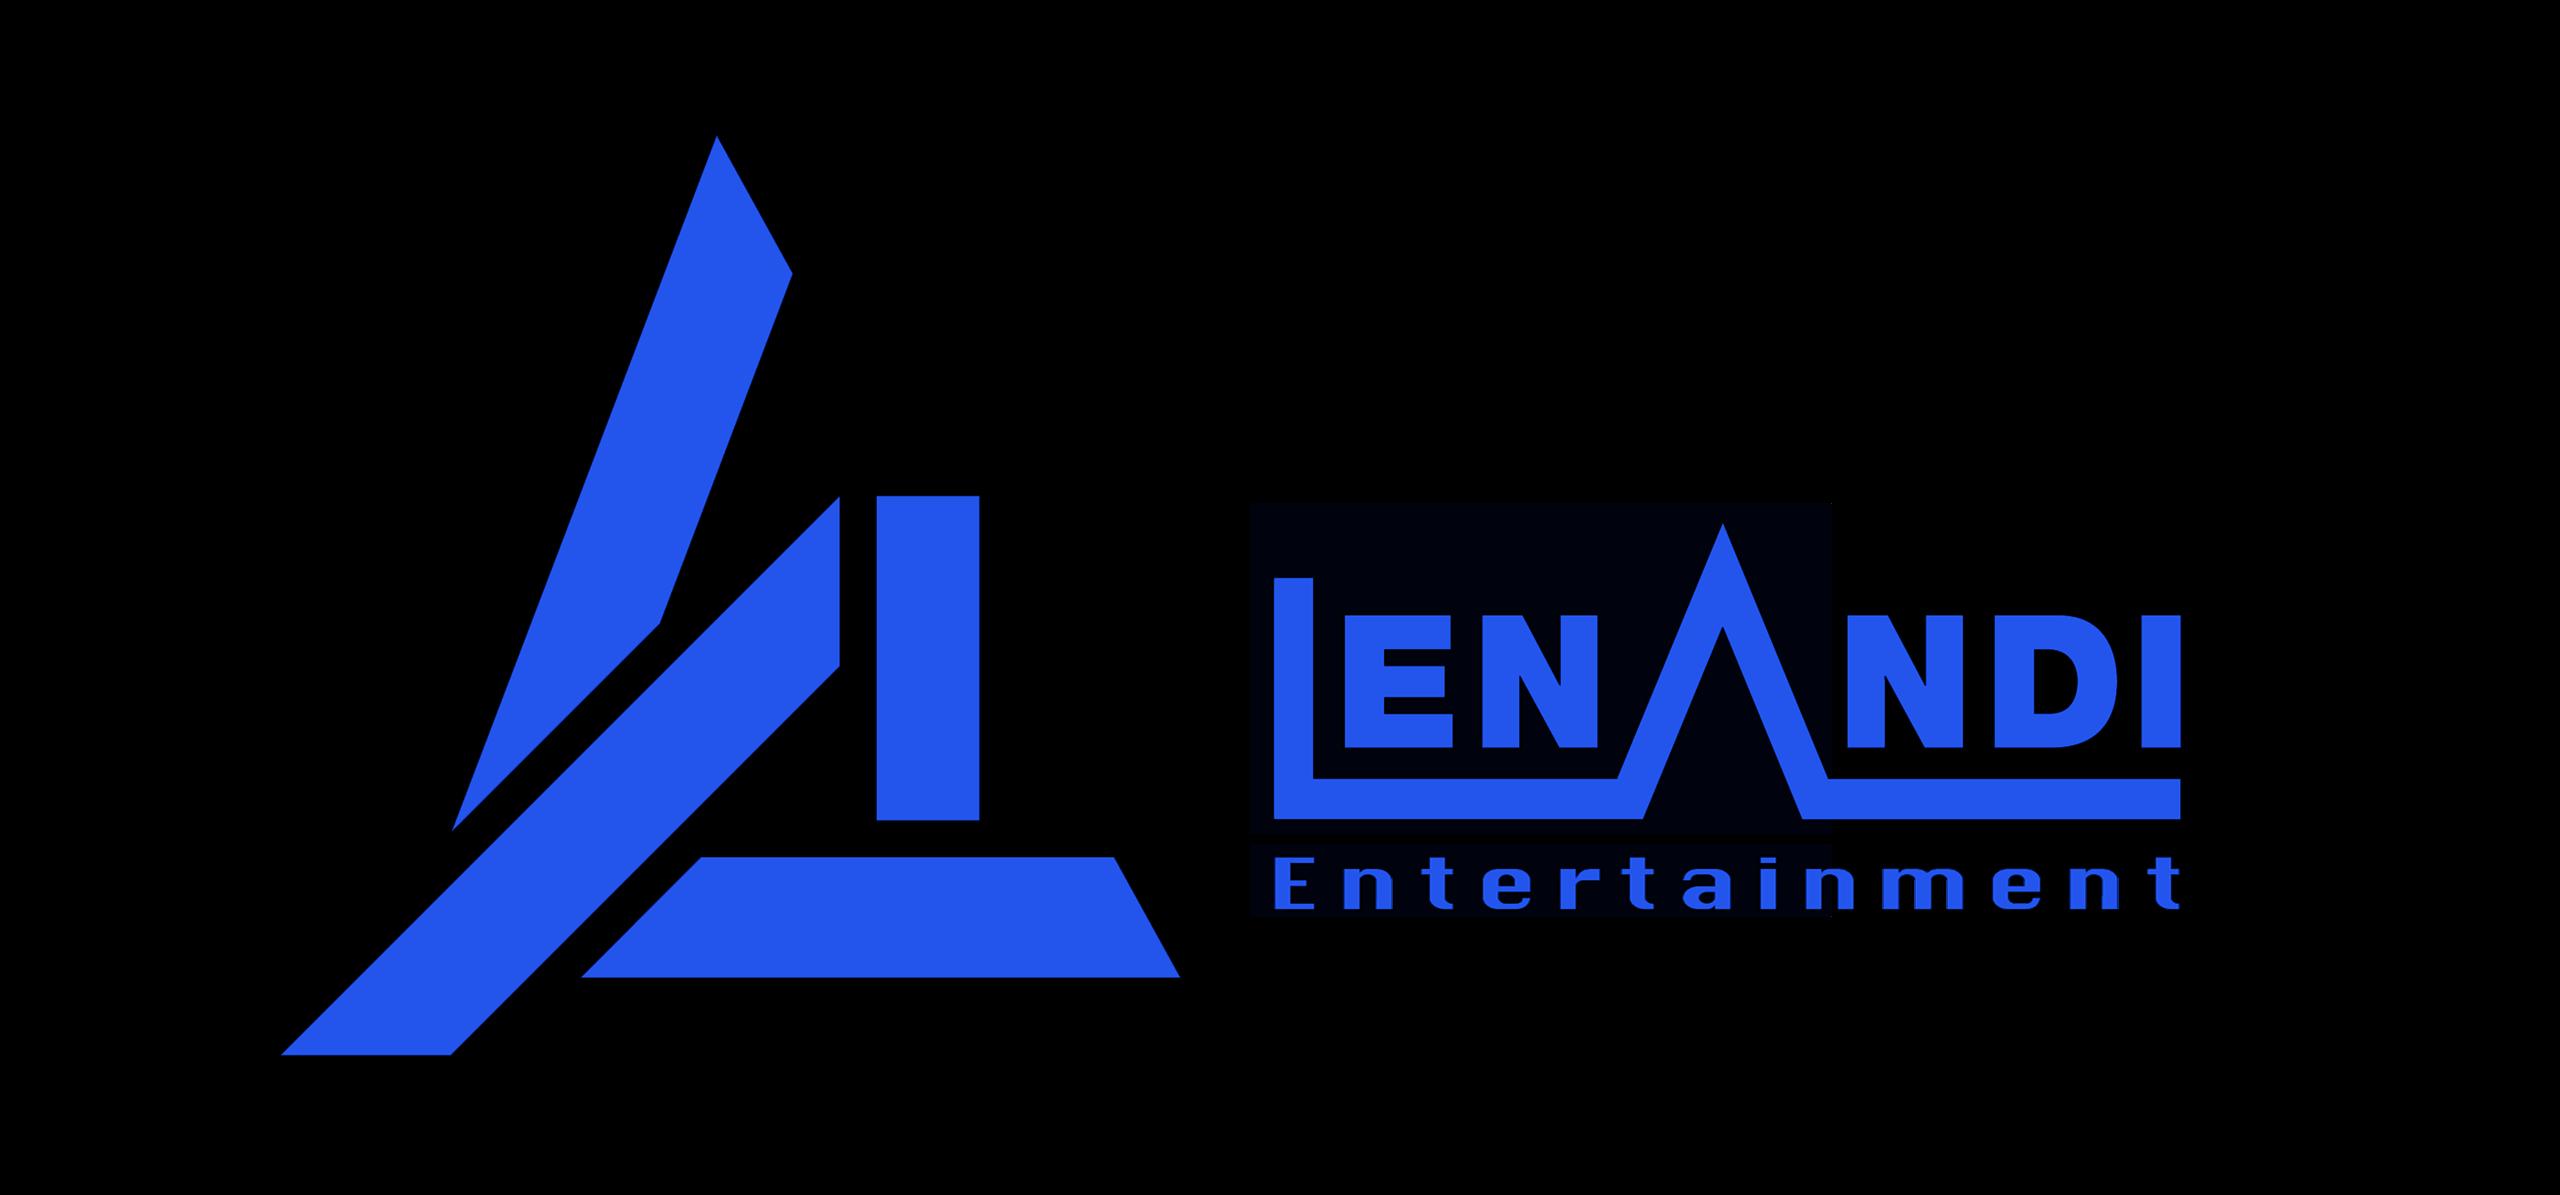 LenAndi Entertainment